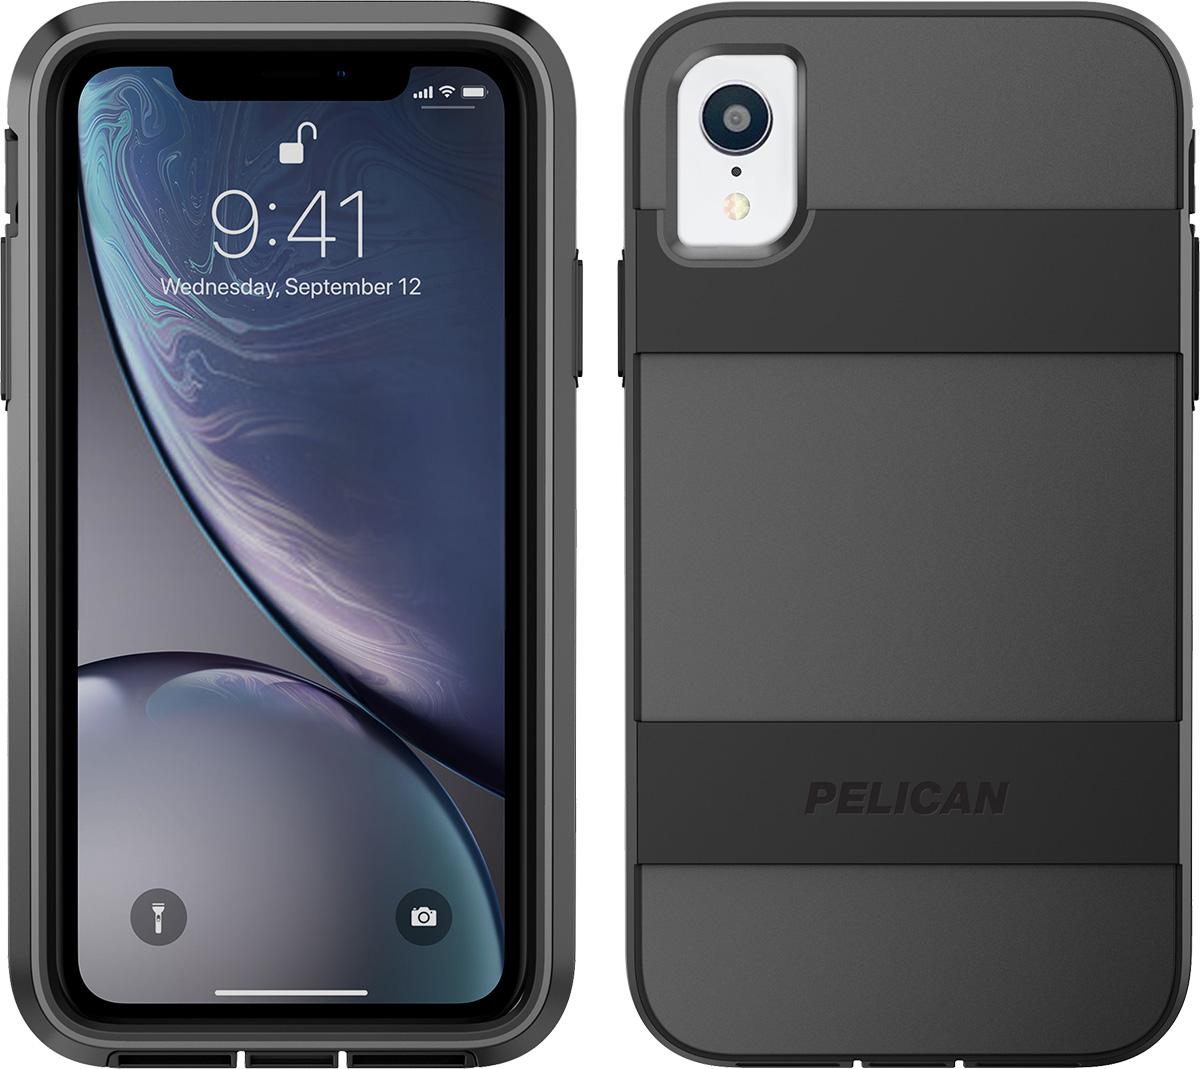 pelican apple iphone c42030 voyager black phone case